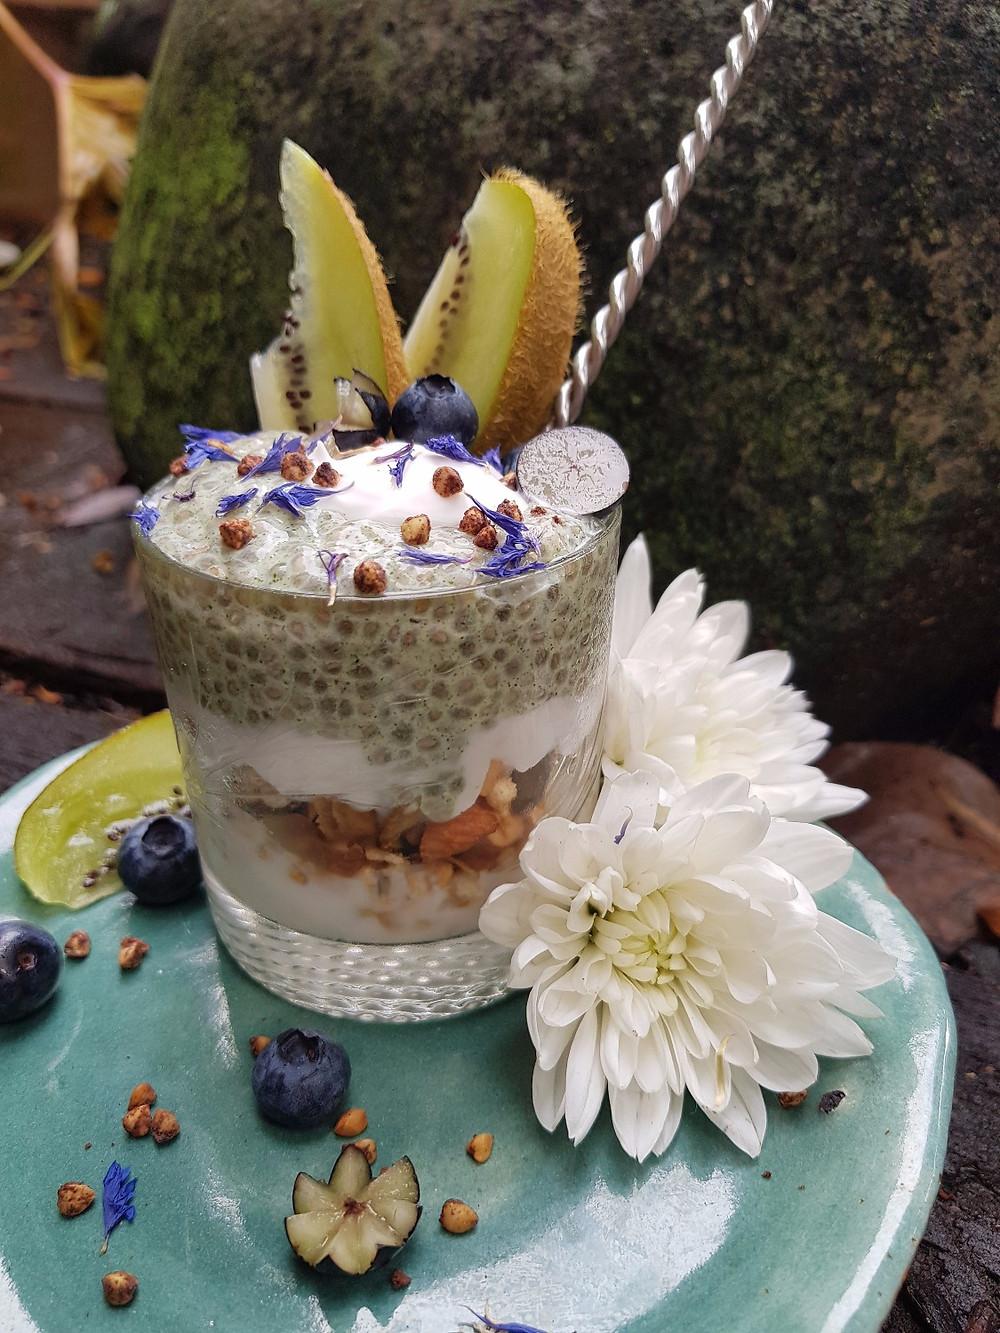 Kaffir Lime Leaf | Chia Pudding | BLUE TEA